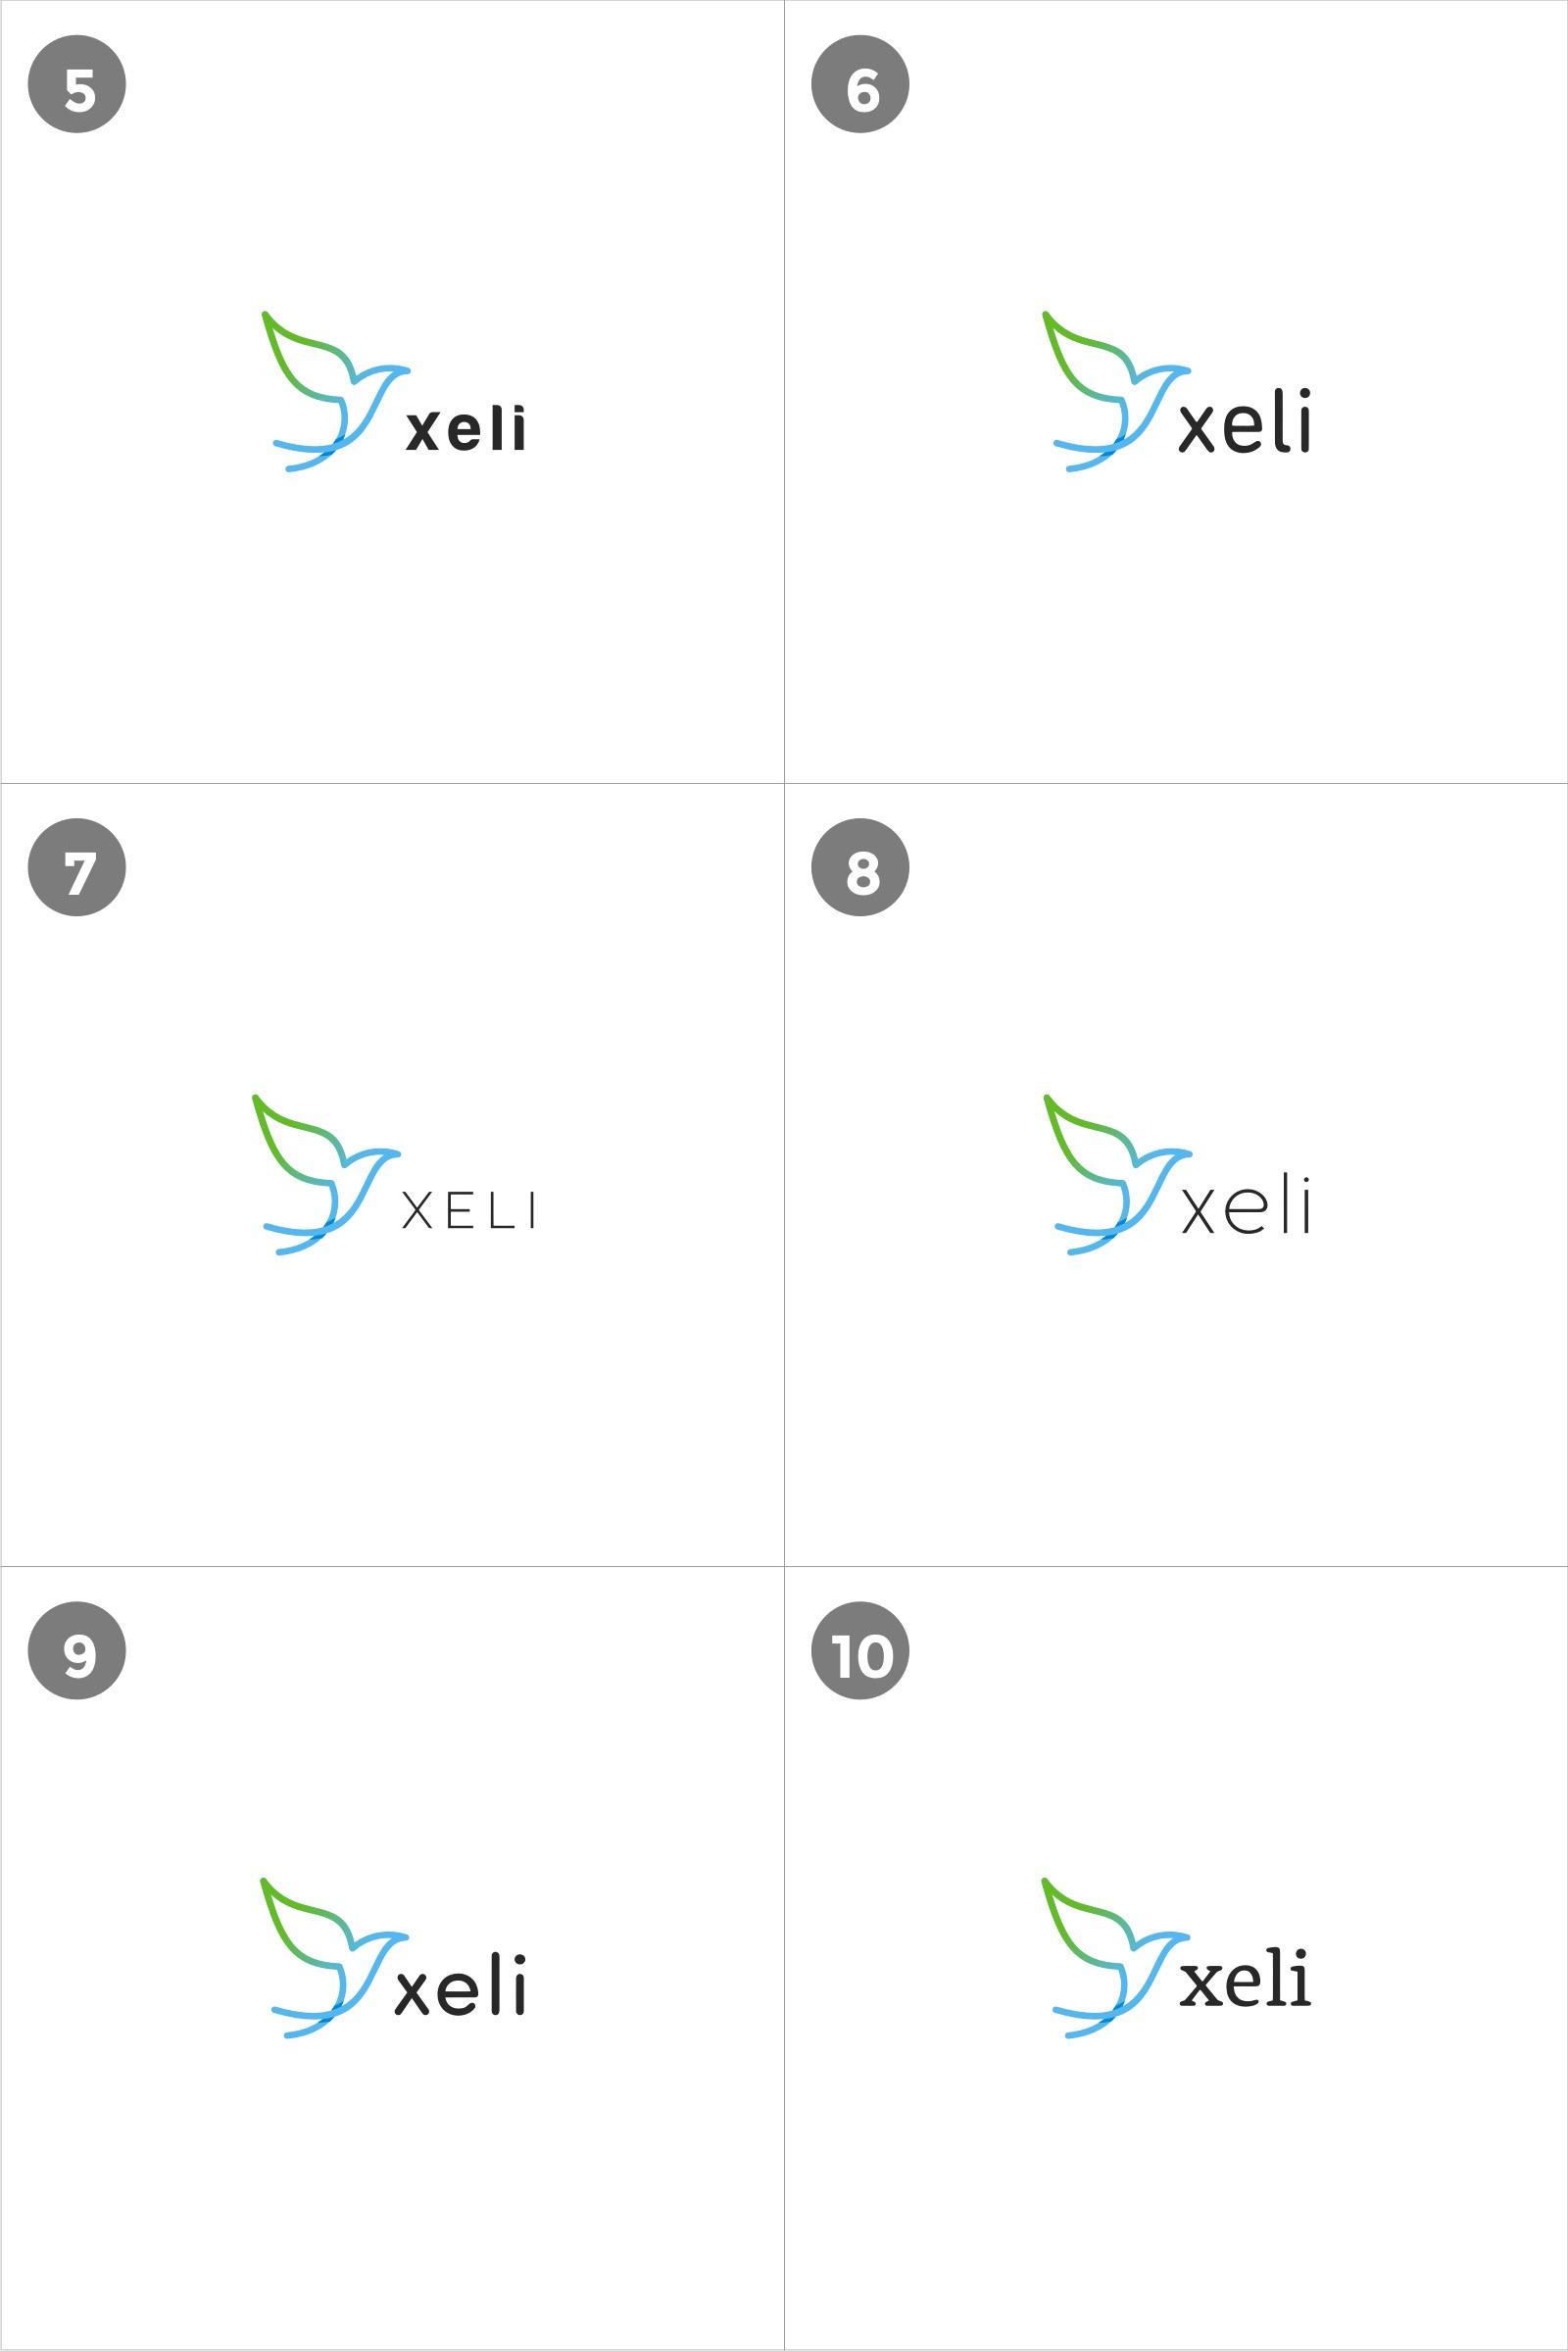 Create fresh and clean logo for Xeli - online tour operator (no stock photos, only original work)